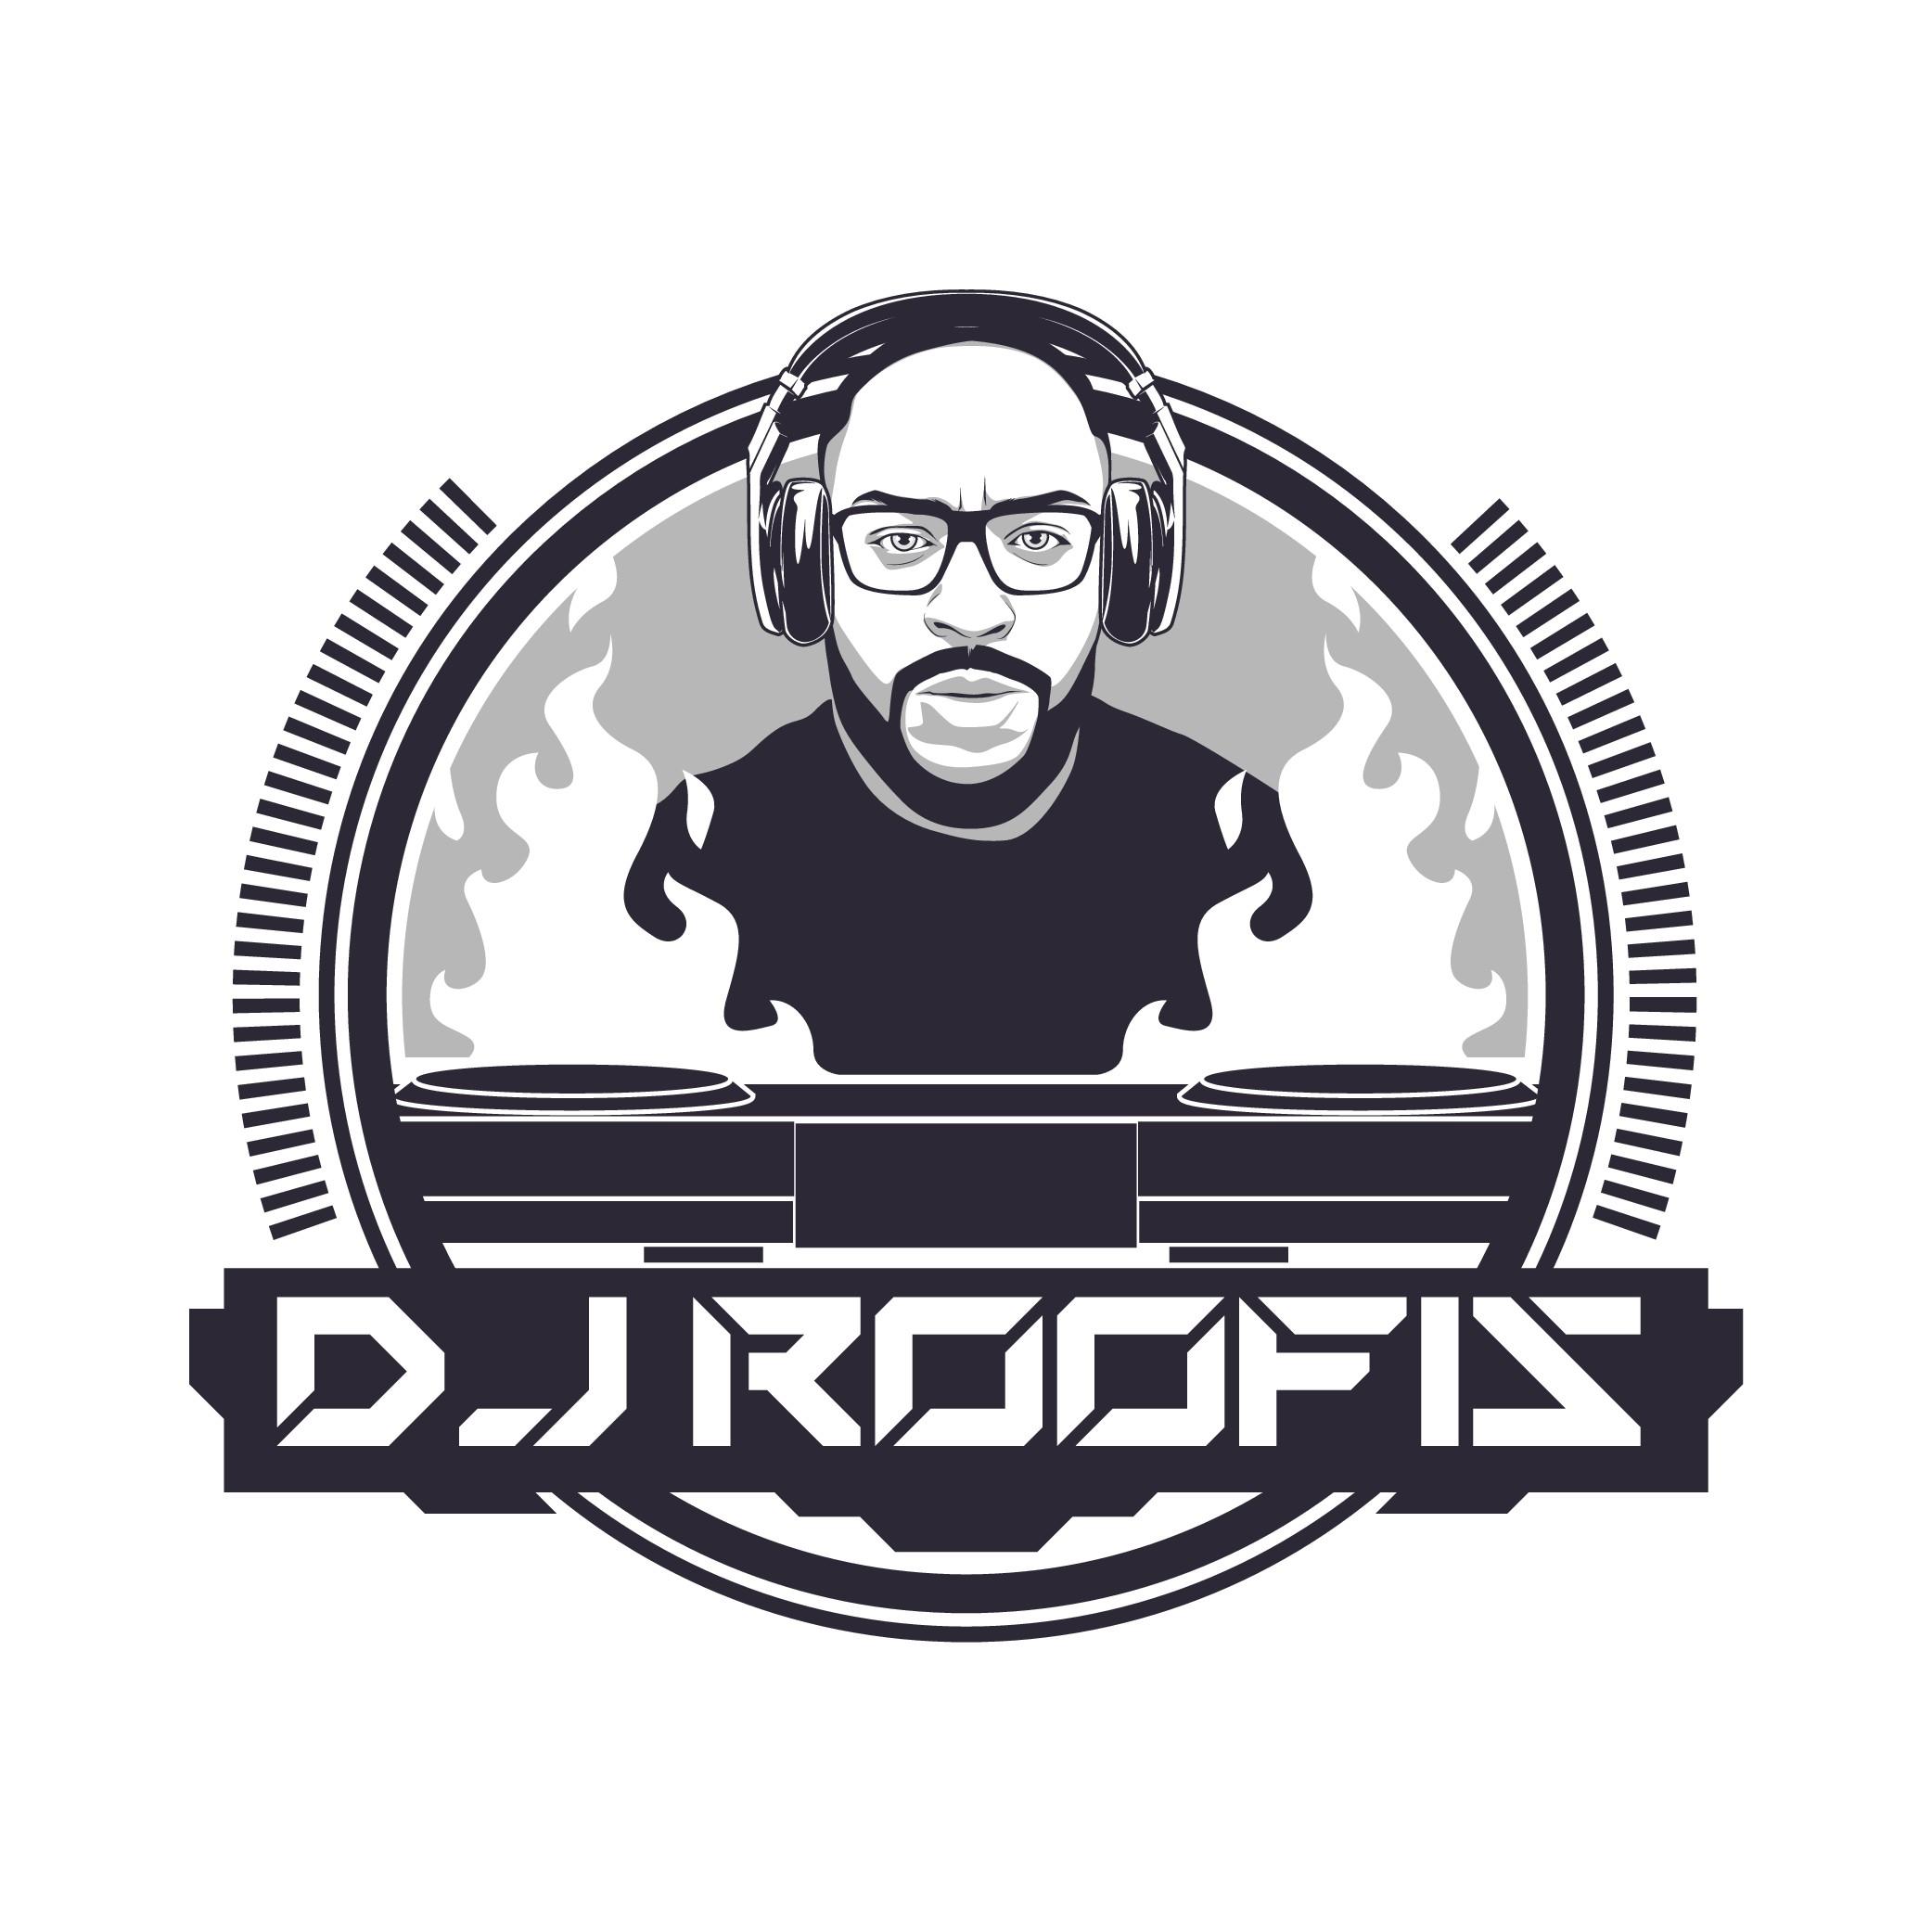 Cutting edge logo for nerdy but cool DJ